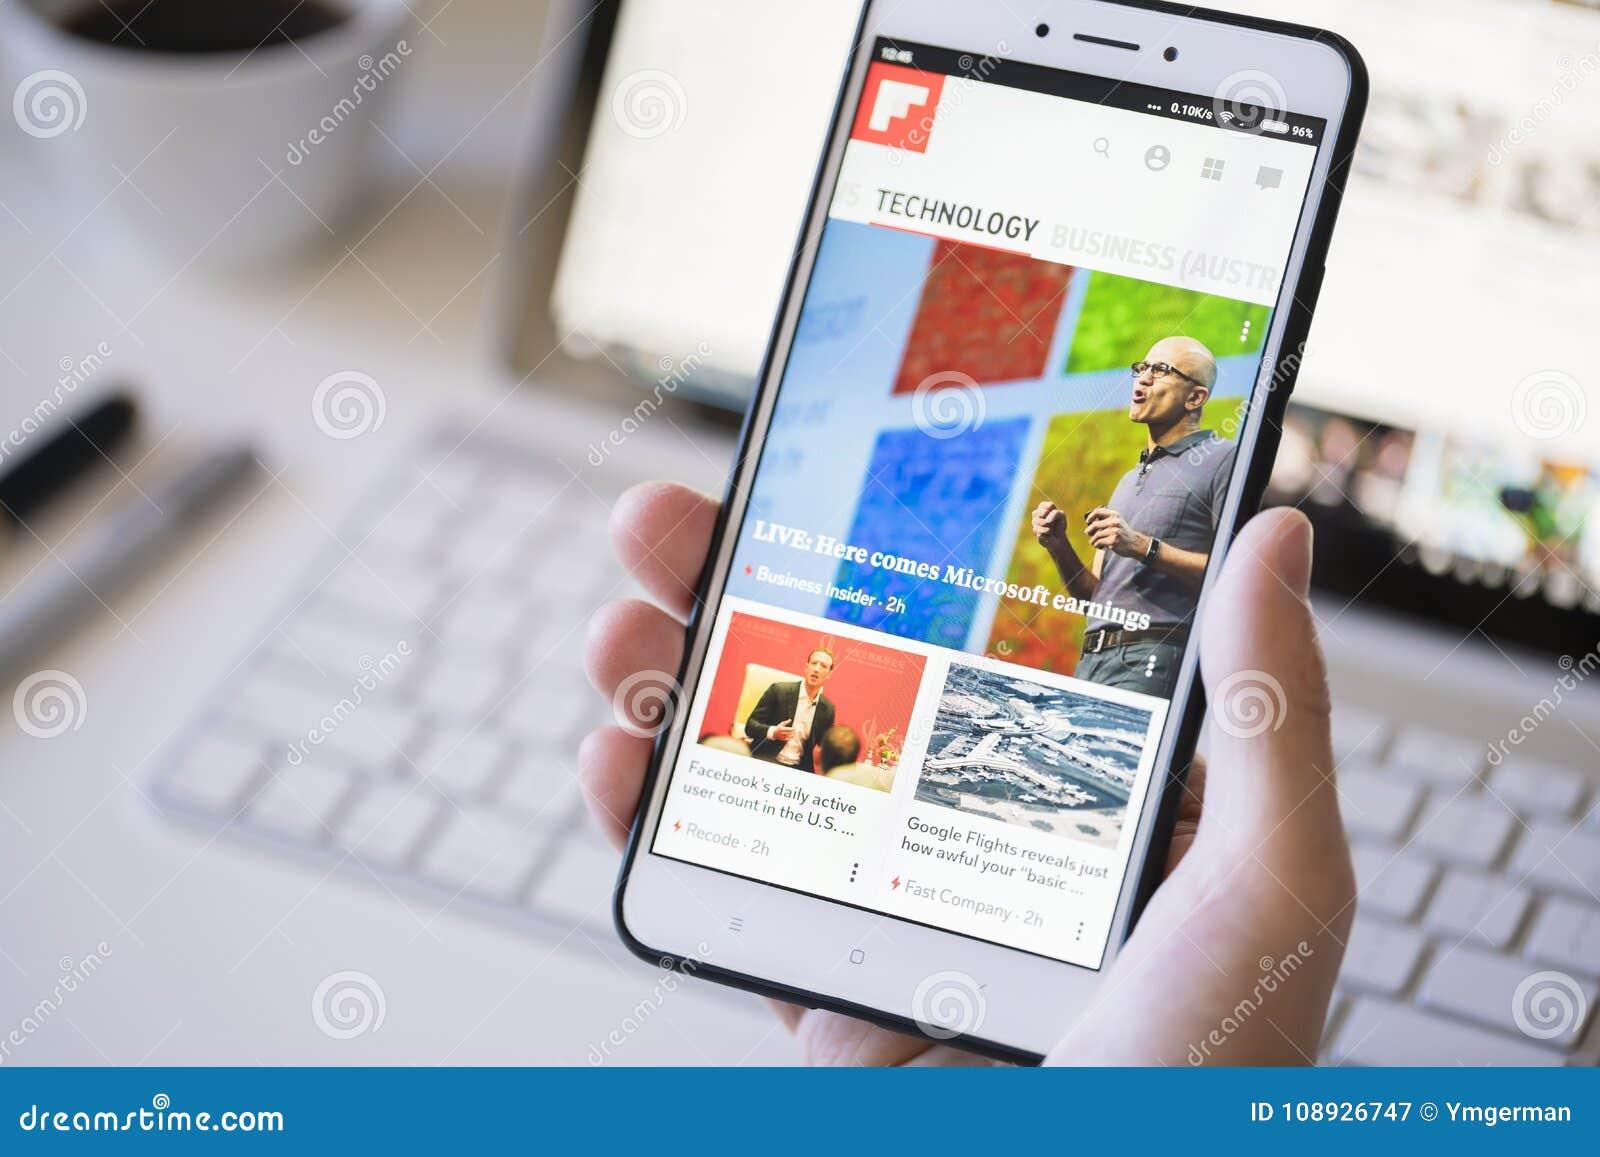 Using the Flipboard app on a smartphone